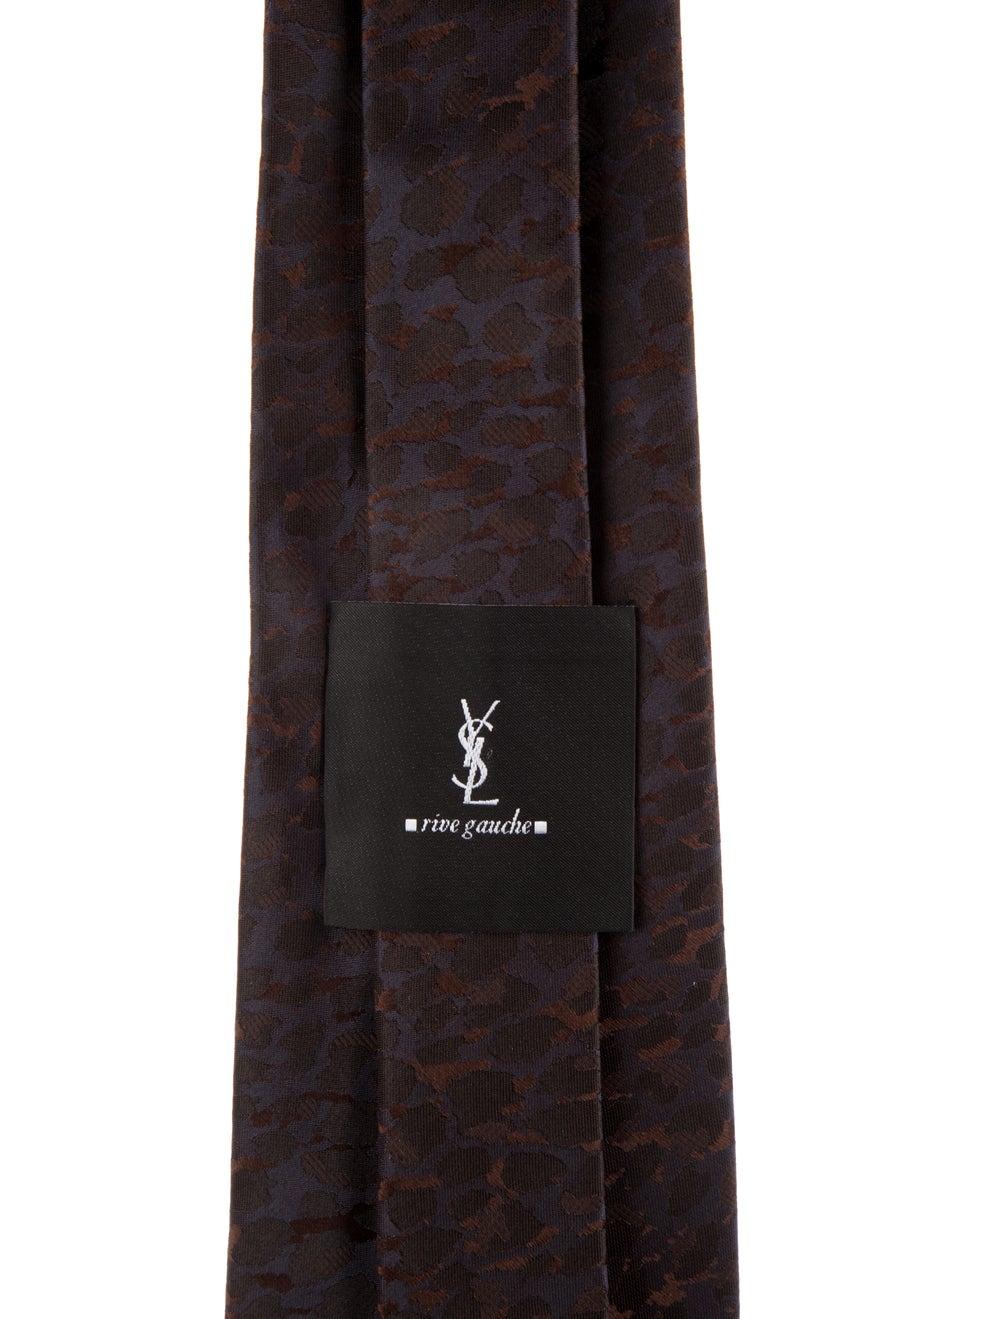 Yves Saint Laurent Rive Gauche Silk Tie brown - image 2